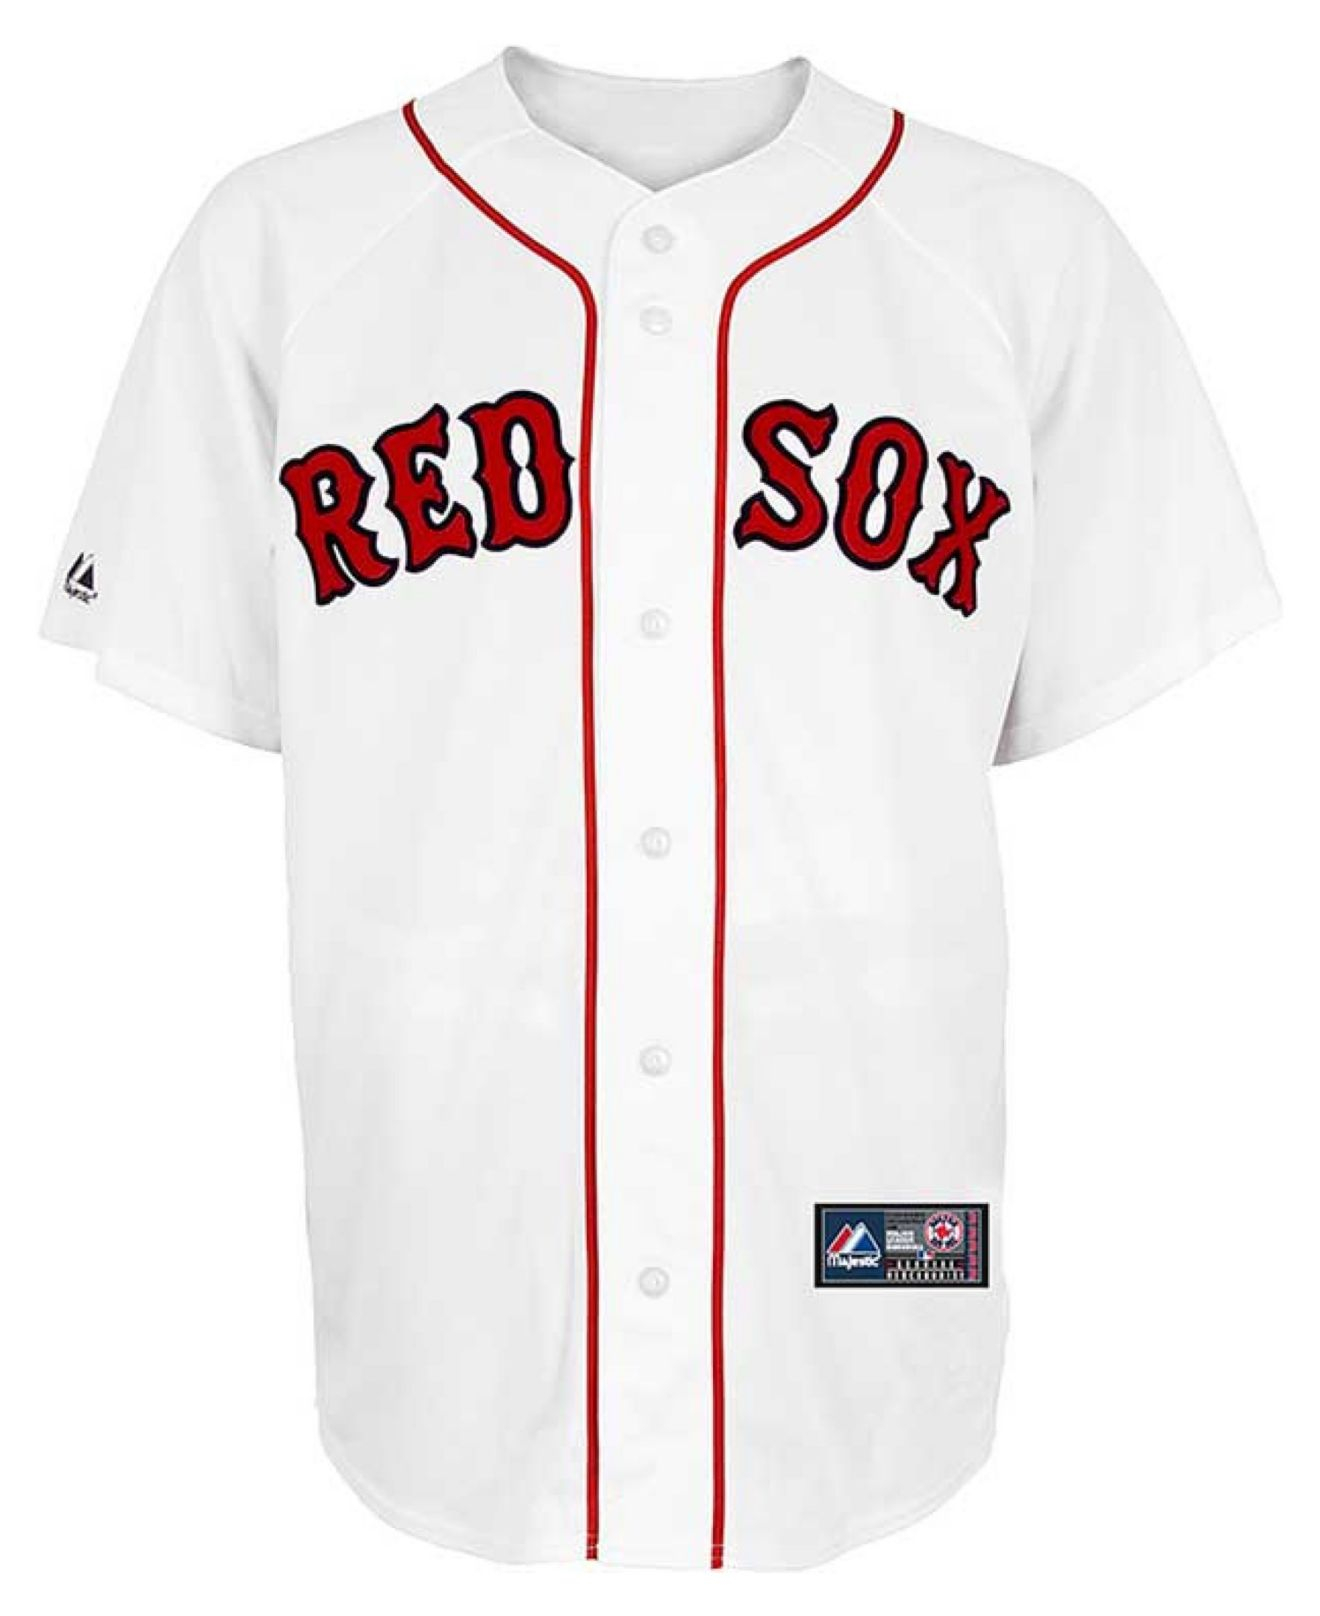 Red Sox Womens Shirt